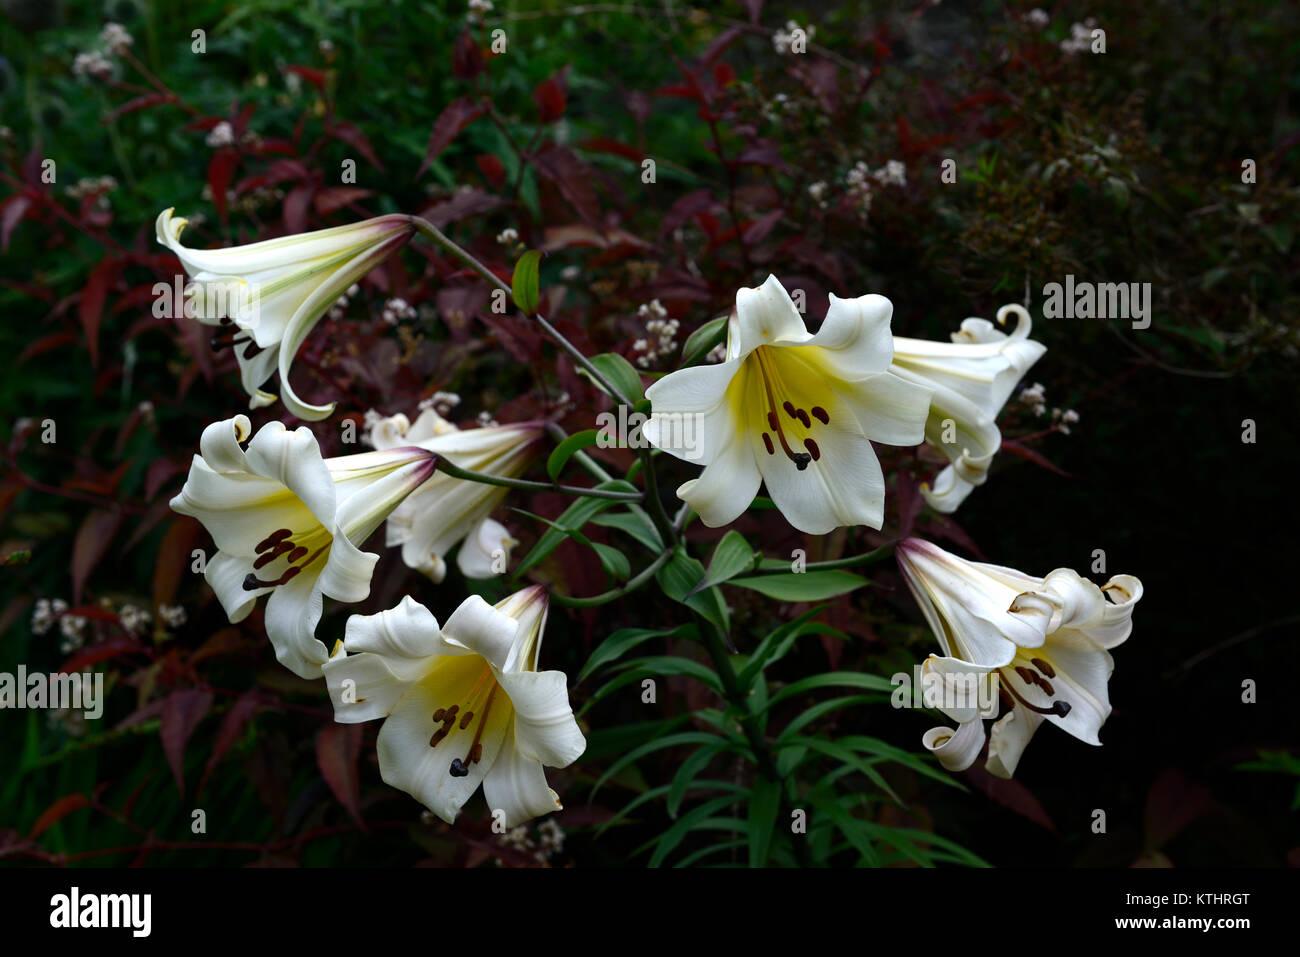 Lilium stock photo 170036744 alamy lilium browniililylilieswhiteflowerflowerstrumpetfloweringplant portraitscloseuprm floral izmirmasajfo